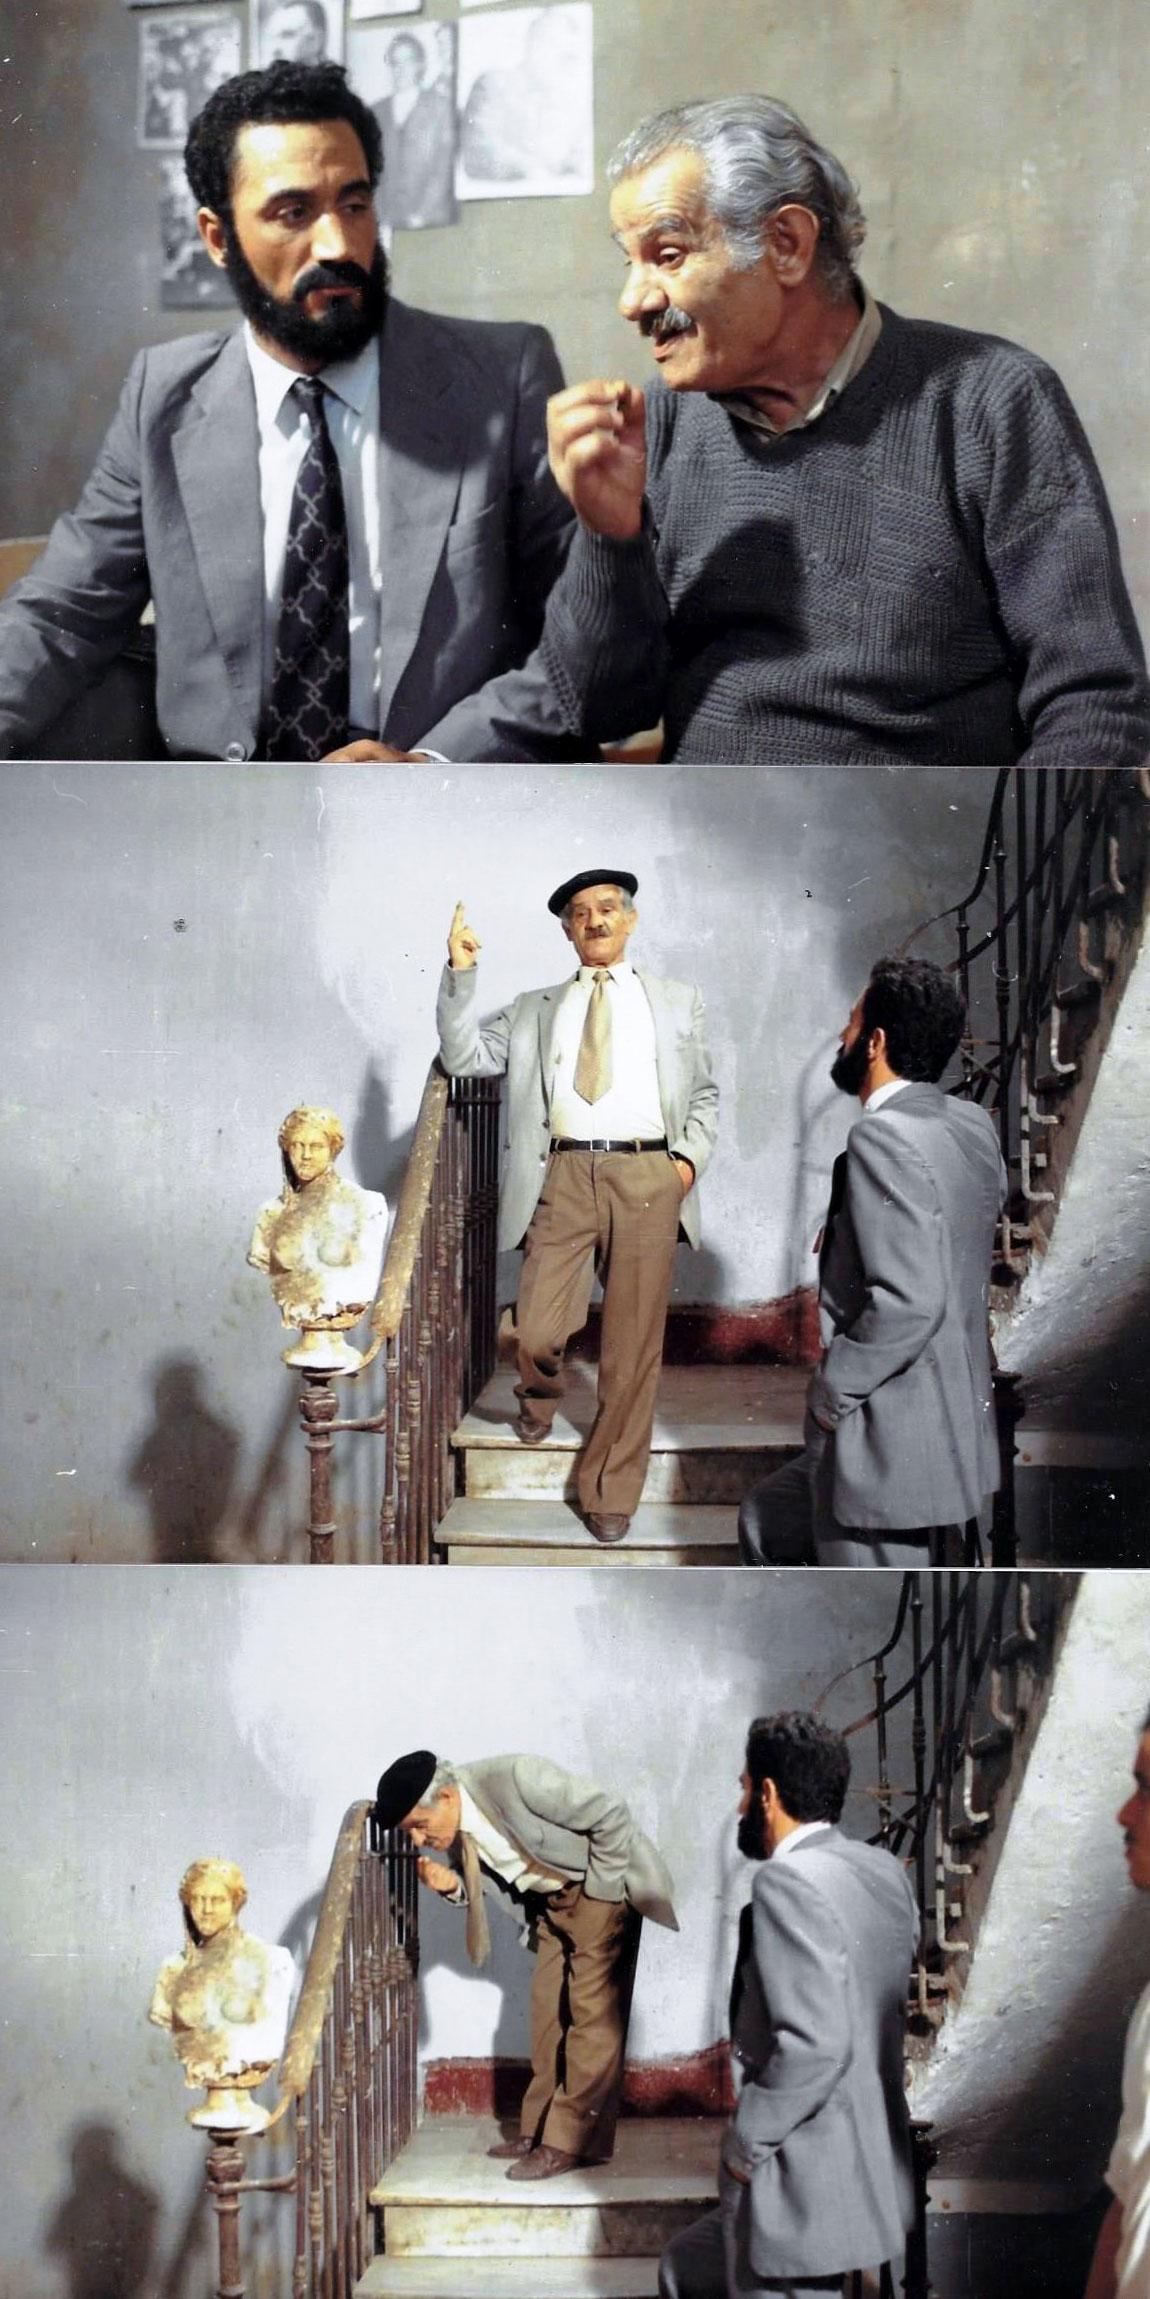 Les-Riches-et-les-Pauvres.-Mustapha-Halo-+-Mohamed-Fellag----1988-LUMIERES